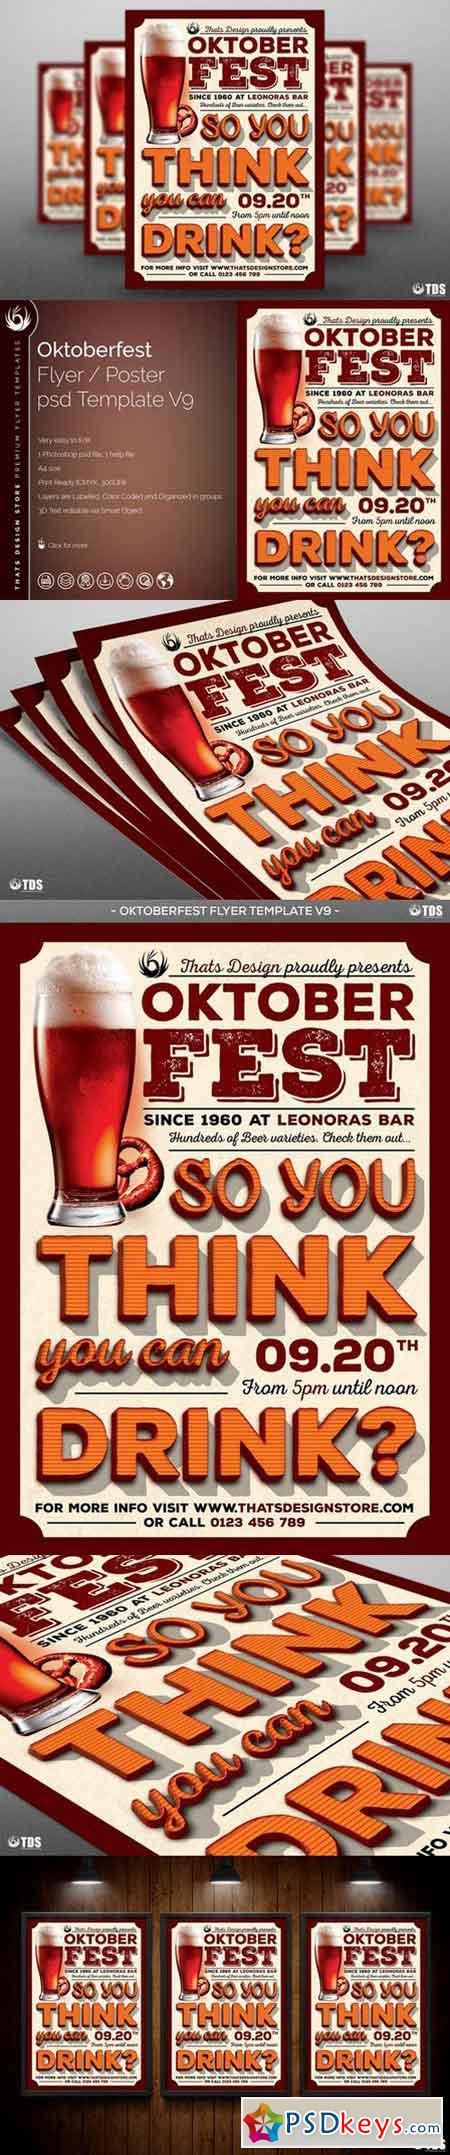 Oktoberfest Flyer Template V9 848721